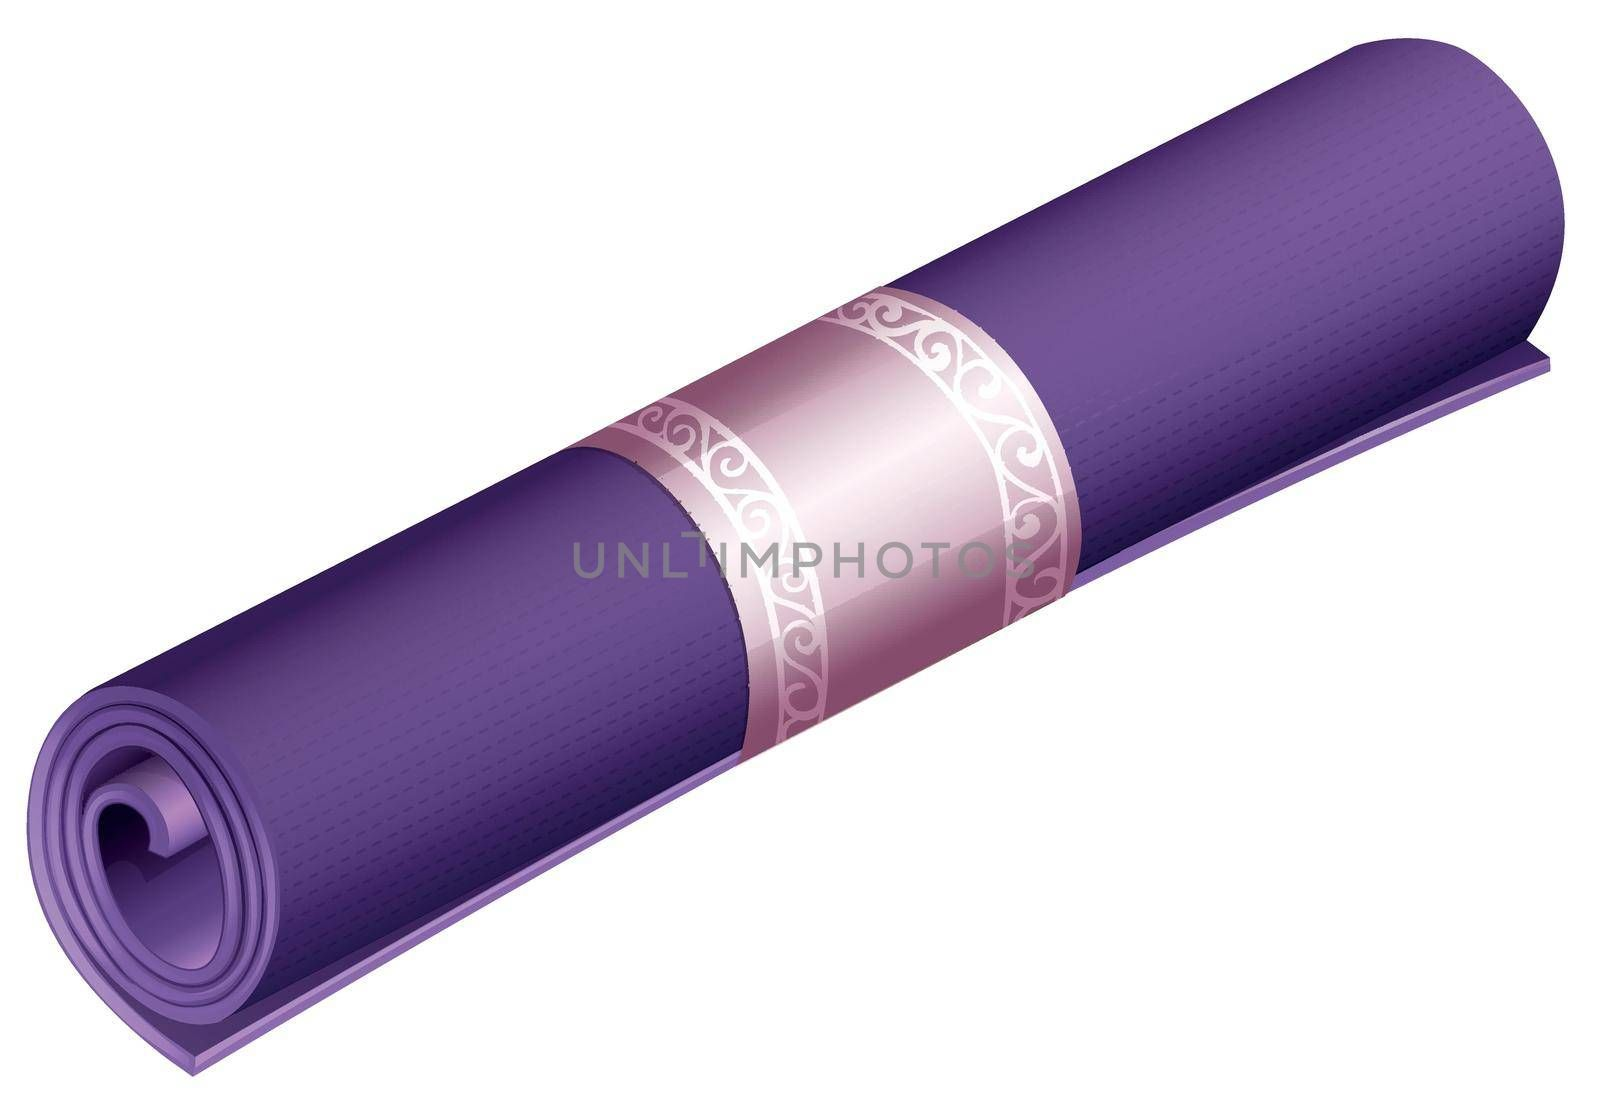 Simple purple yoga or camping mat illustration